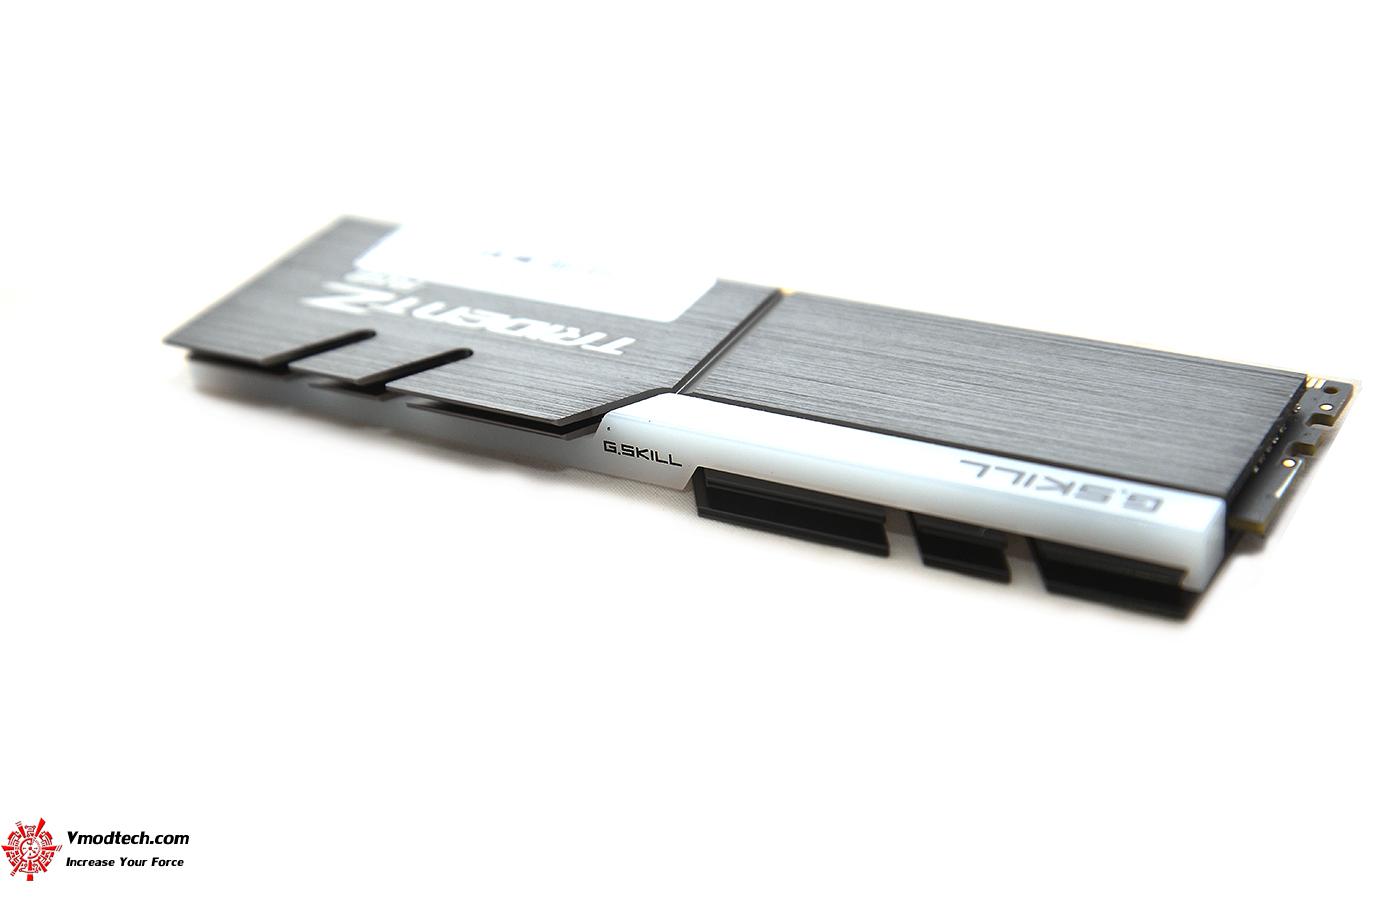 4 G.SKILL Trident Z RGB DDR4 3200MHz 32GB (8GBx4) Quad Channel Review